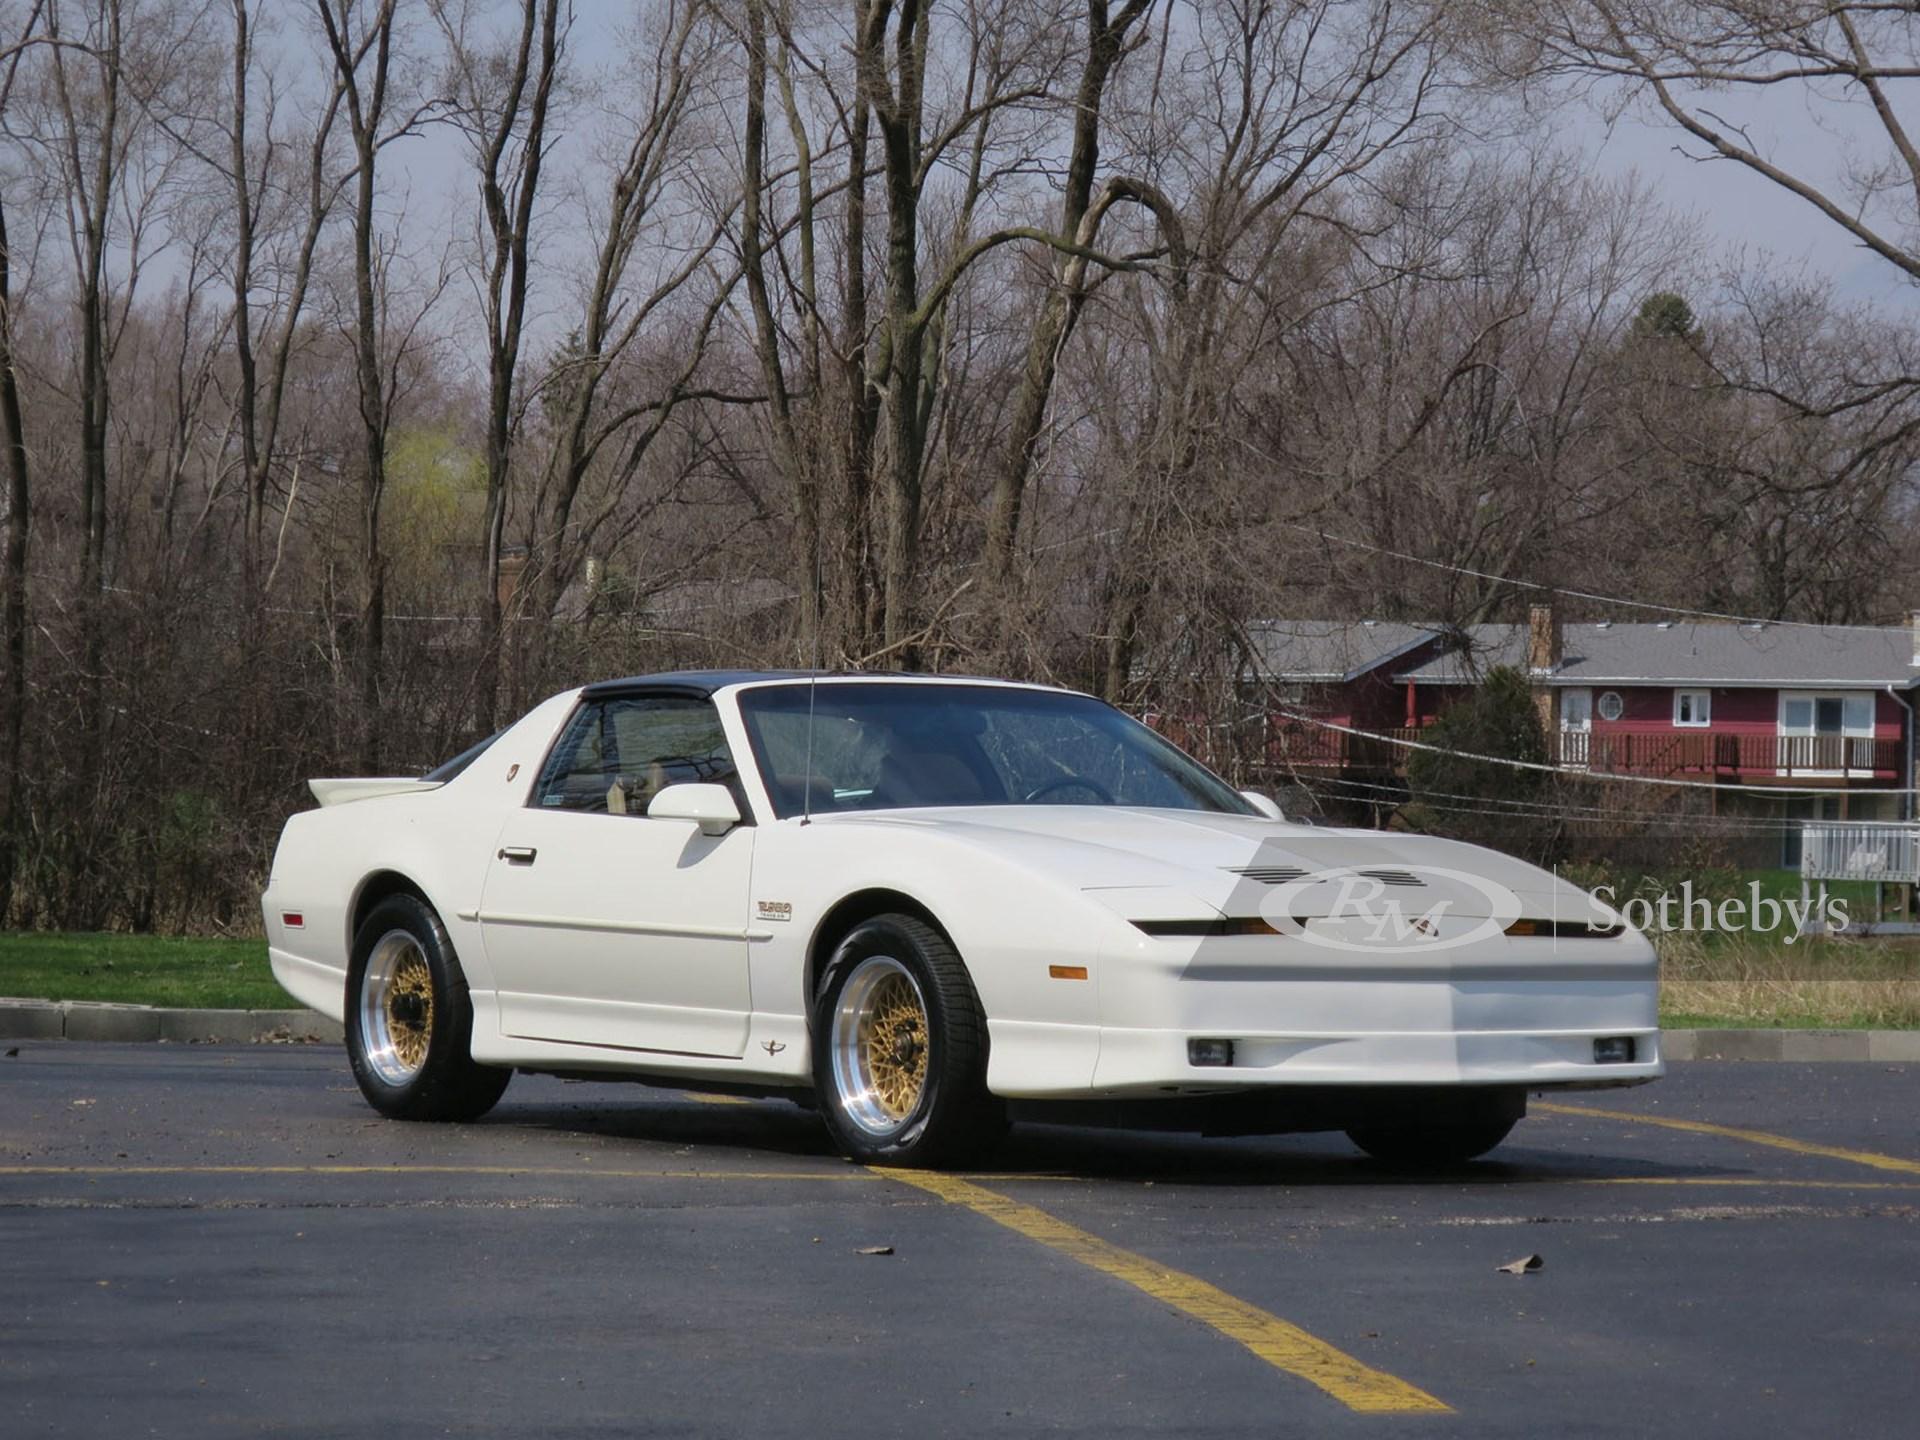 1989 Pontiac Firebird Trans Am Turbo GTA